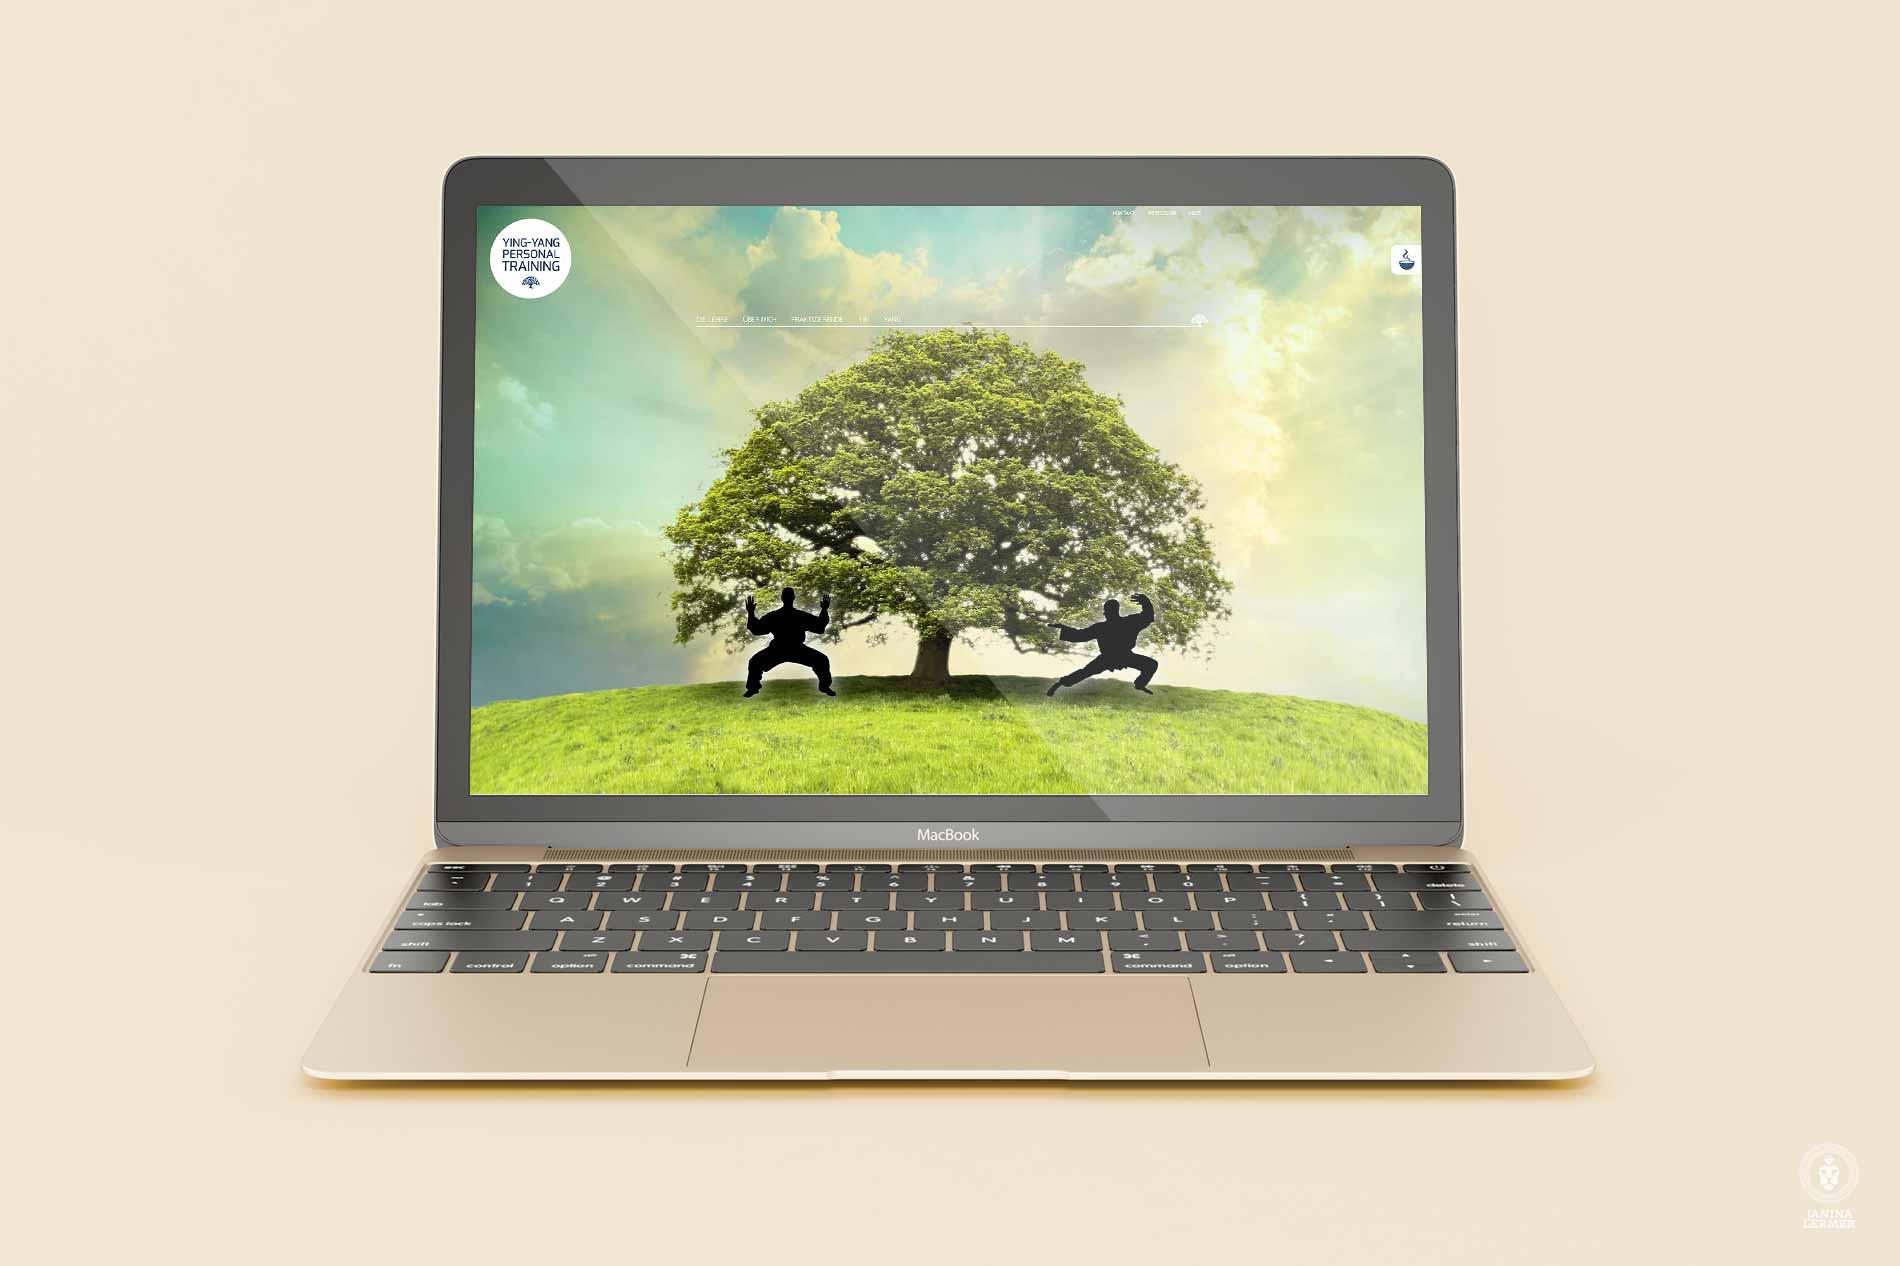 Webseitenkonzept-Webseitengestaltung-Webdesign-Yin-Yang-PersonalTrainer-Ulrich-Lampert-Laptop-Fruehling-Spring